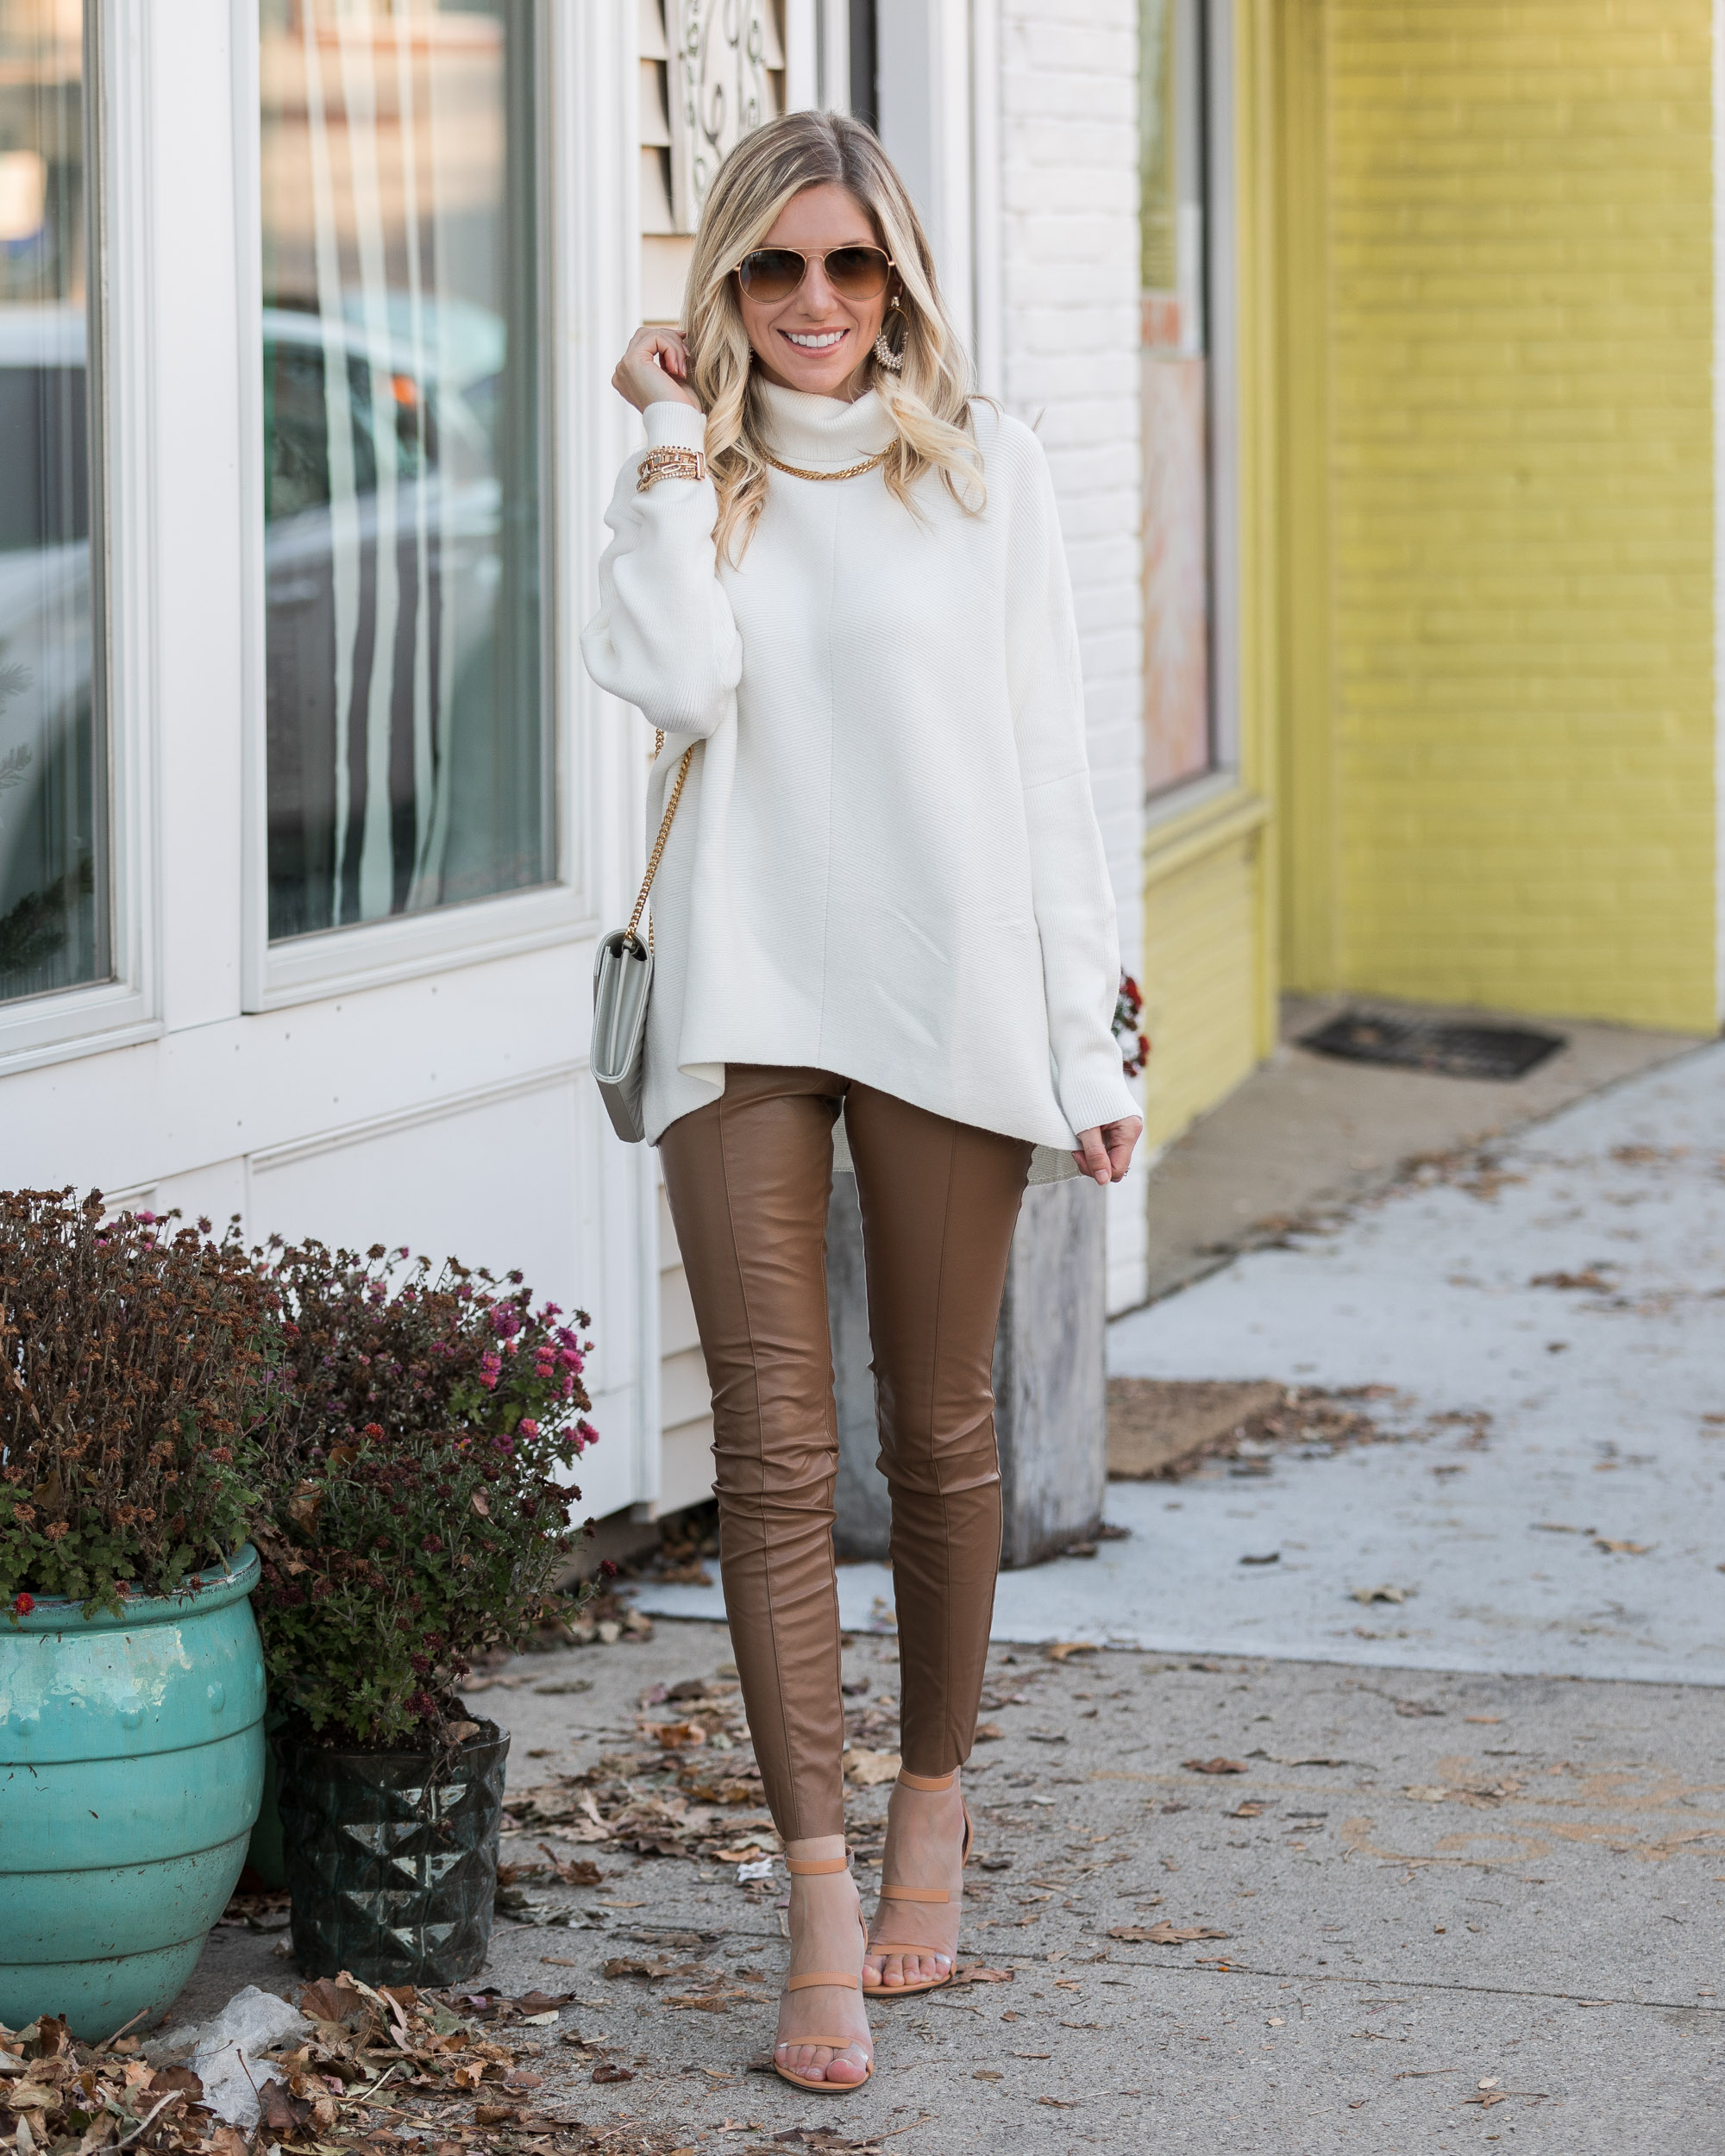 oversized-turtleneck-sweater-from-amazon-the-glamorous-gal